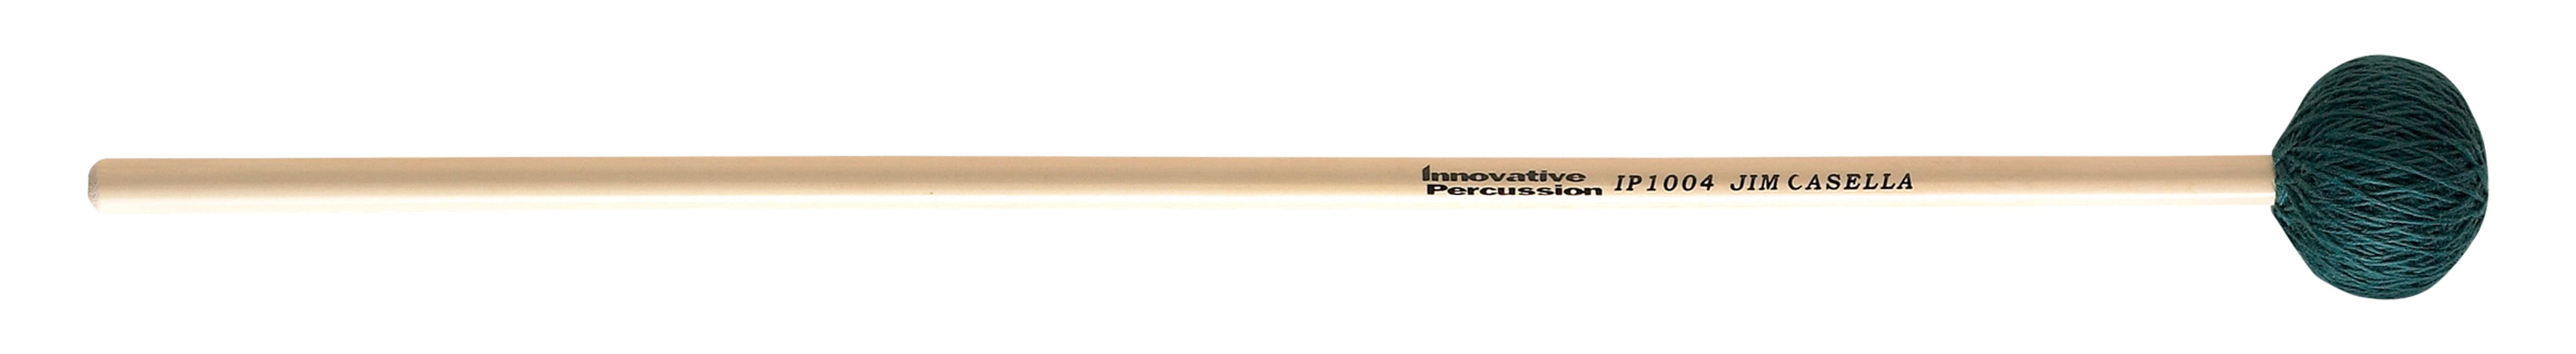 Innovative Percussion IP1004 Jim Casella Series Soft Vibraphone Mallets w  Rattan Handles by Innovative Percussion